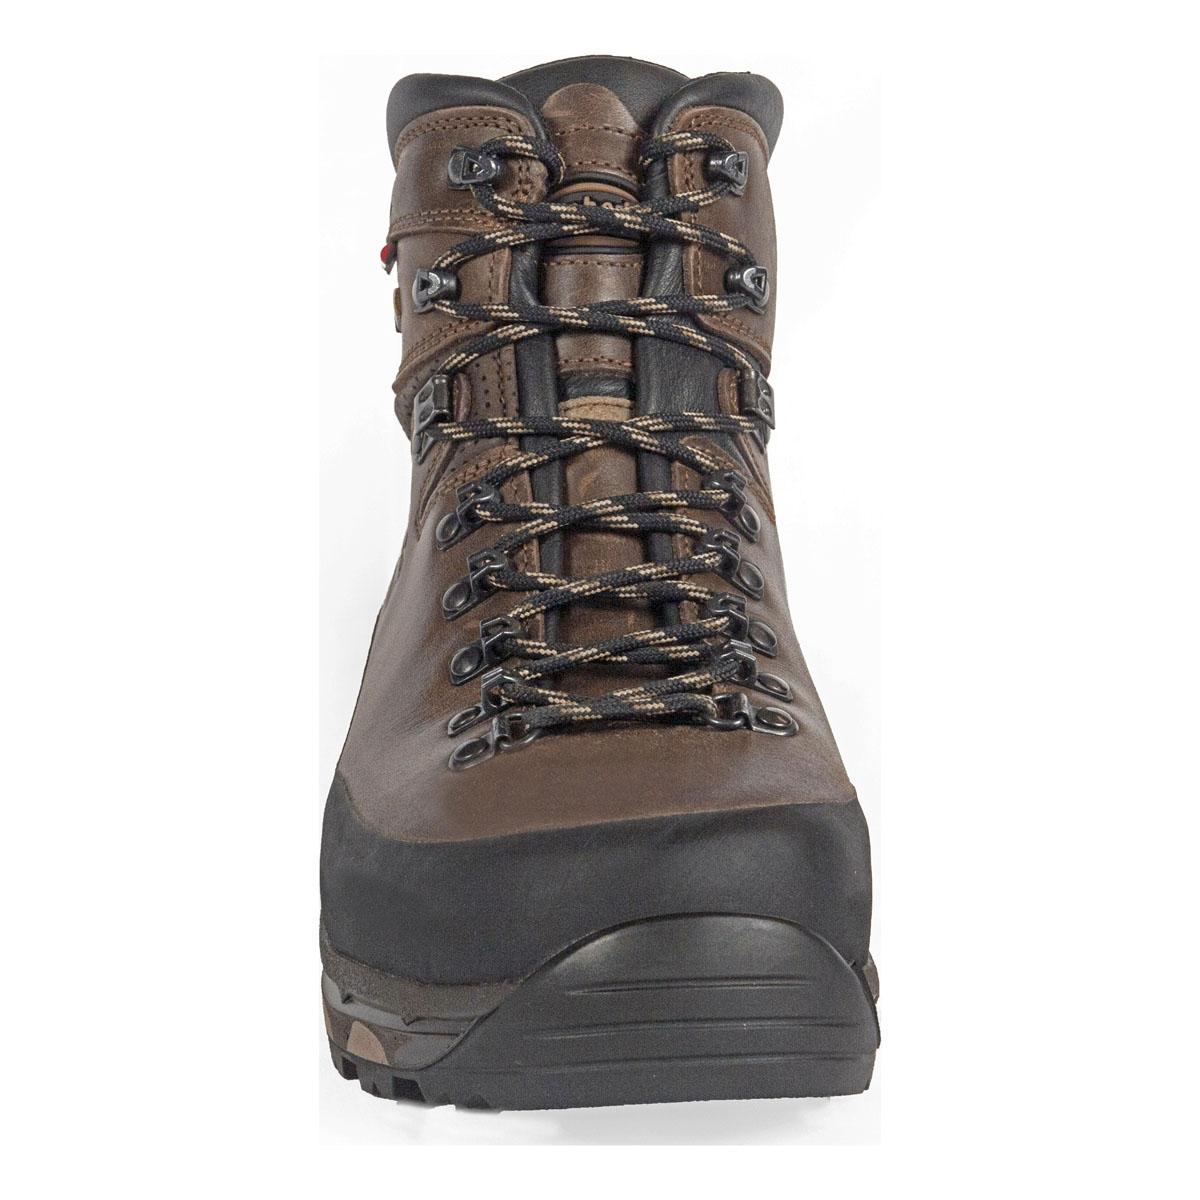 6f025ea64f5 Zamberlan 1006 Vioz Plus GTX RR Walking Boots (Men's) - Waxed Chestnut